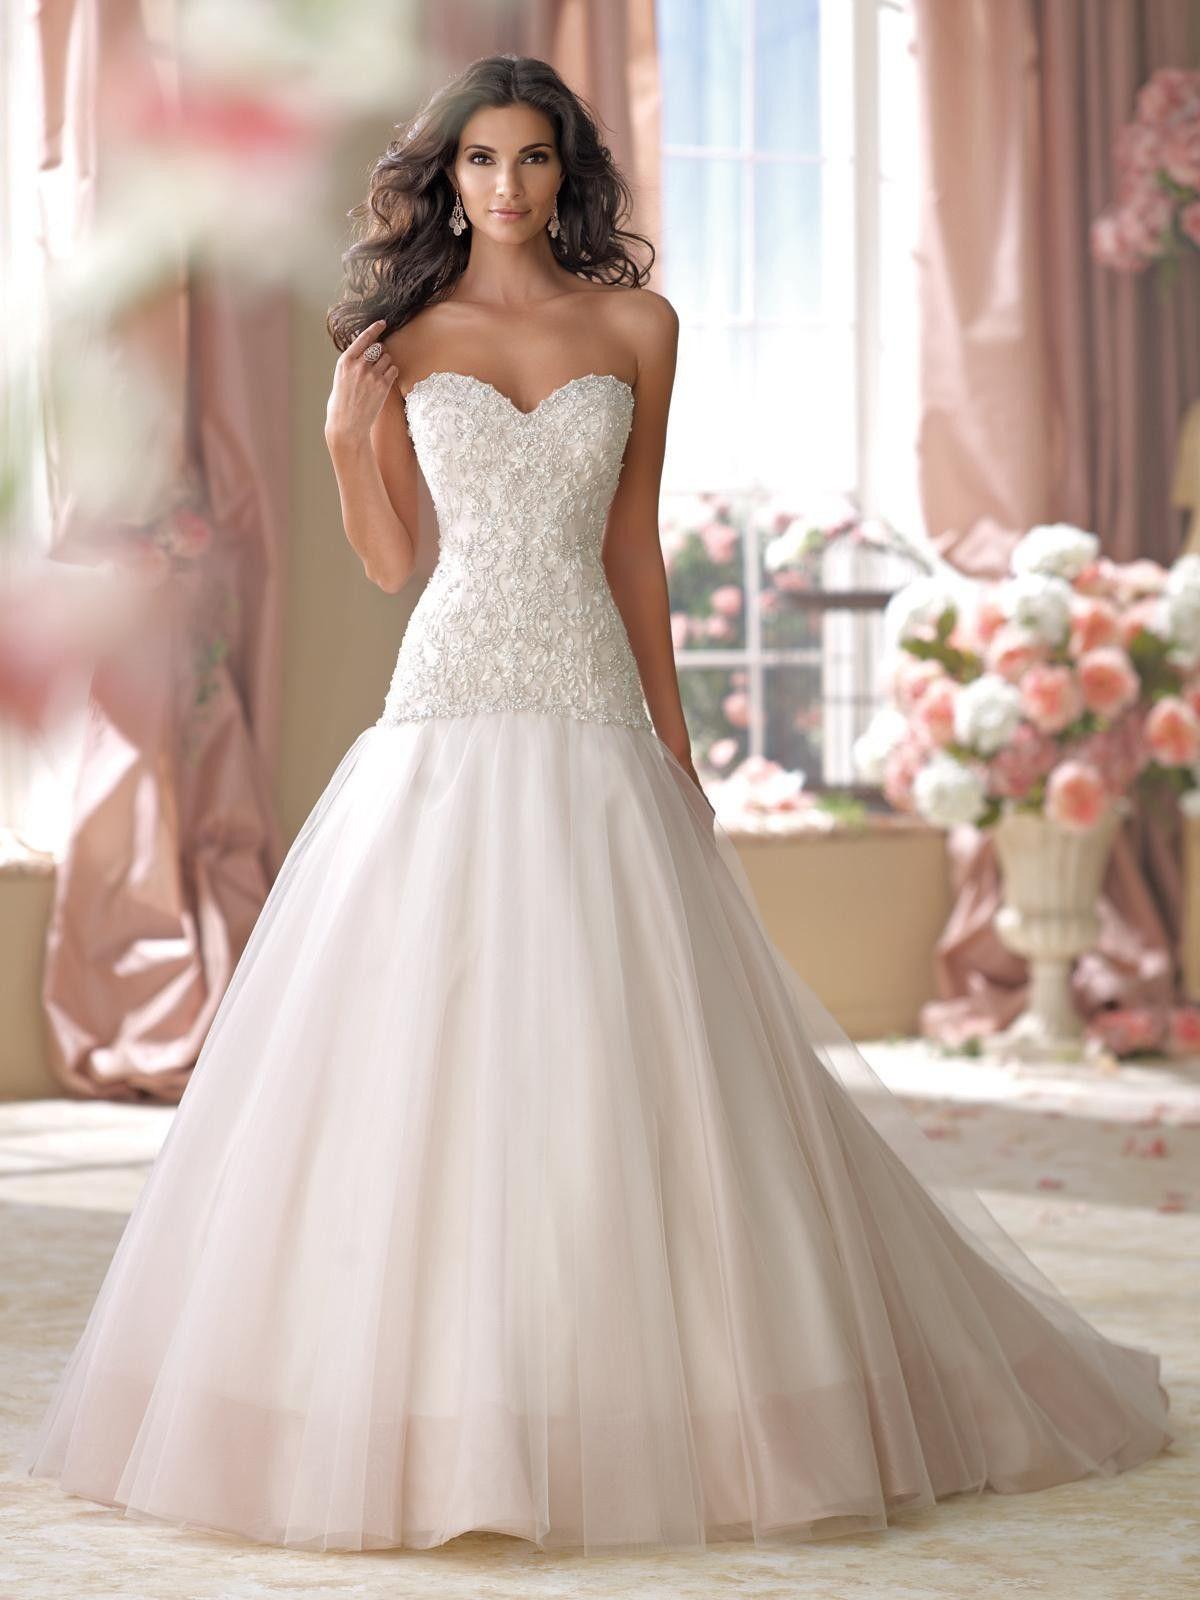 caba4617aba8 Utrolig flott brudekjole selges (ubrukt)